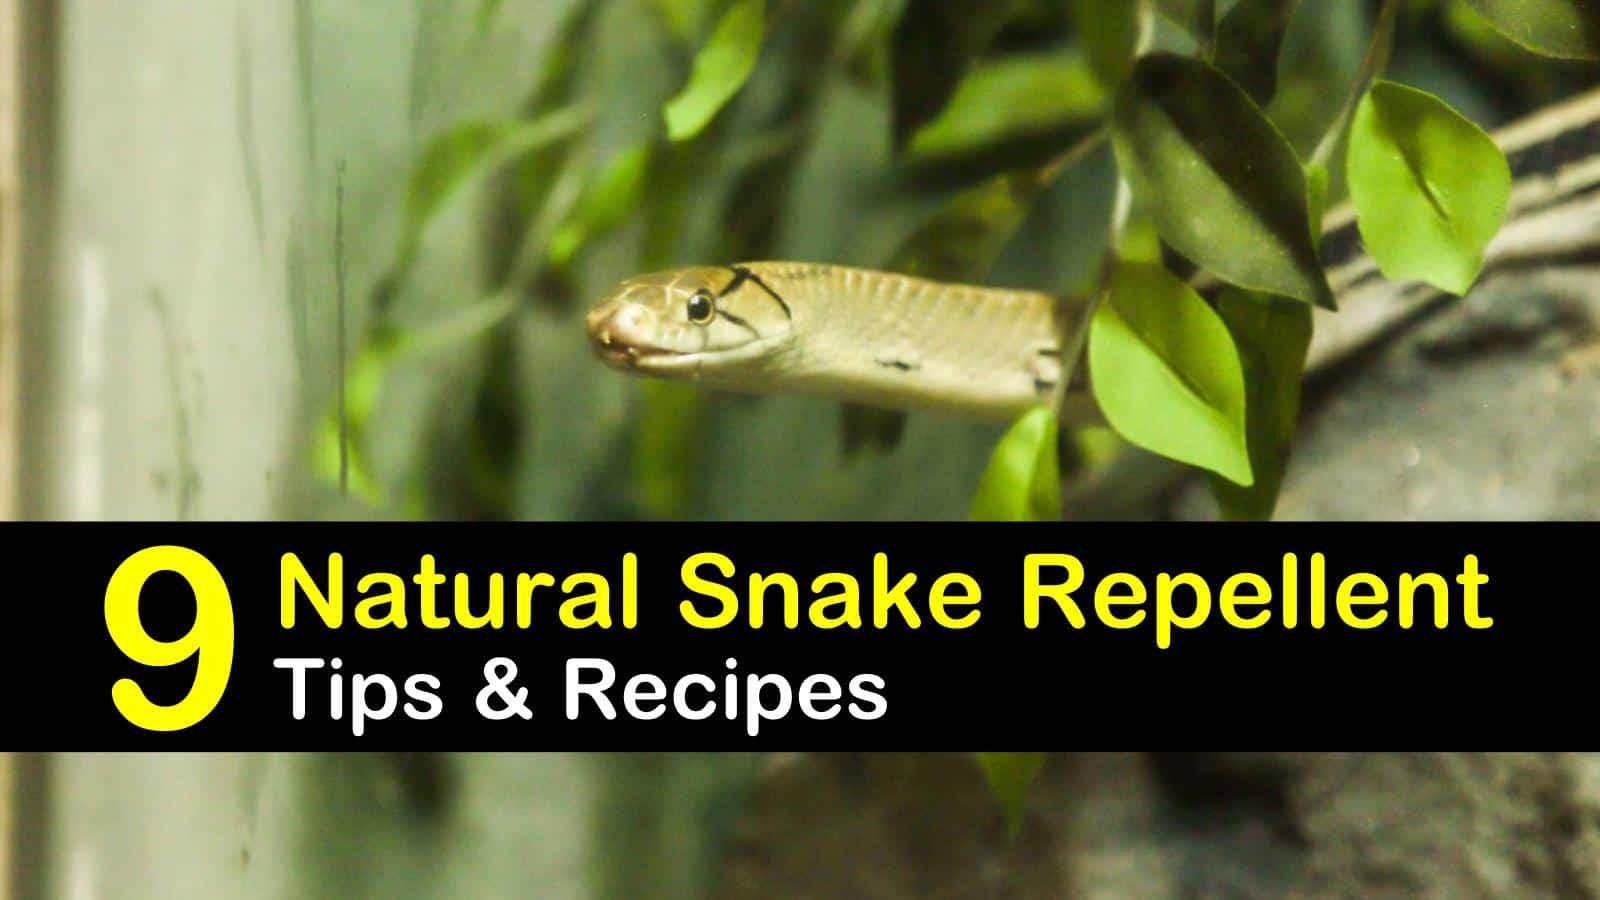 natural snake repellent titleimg1